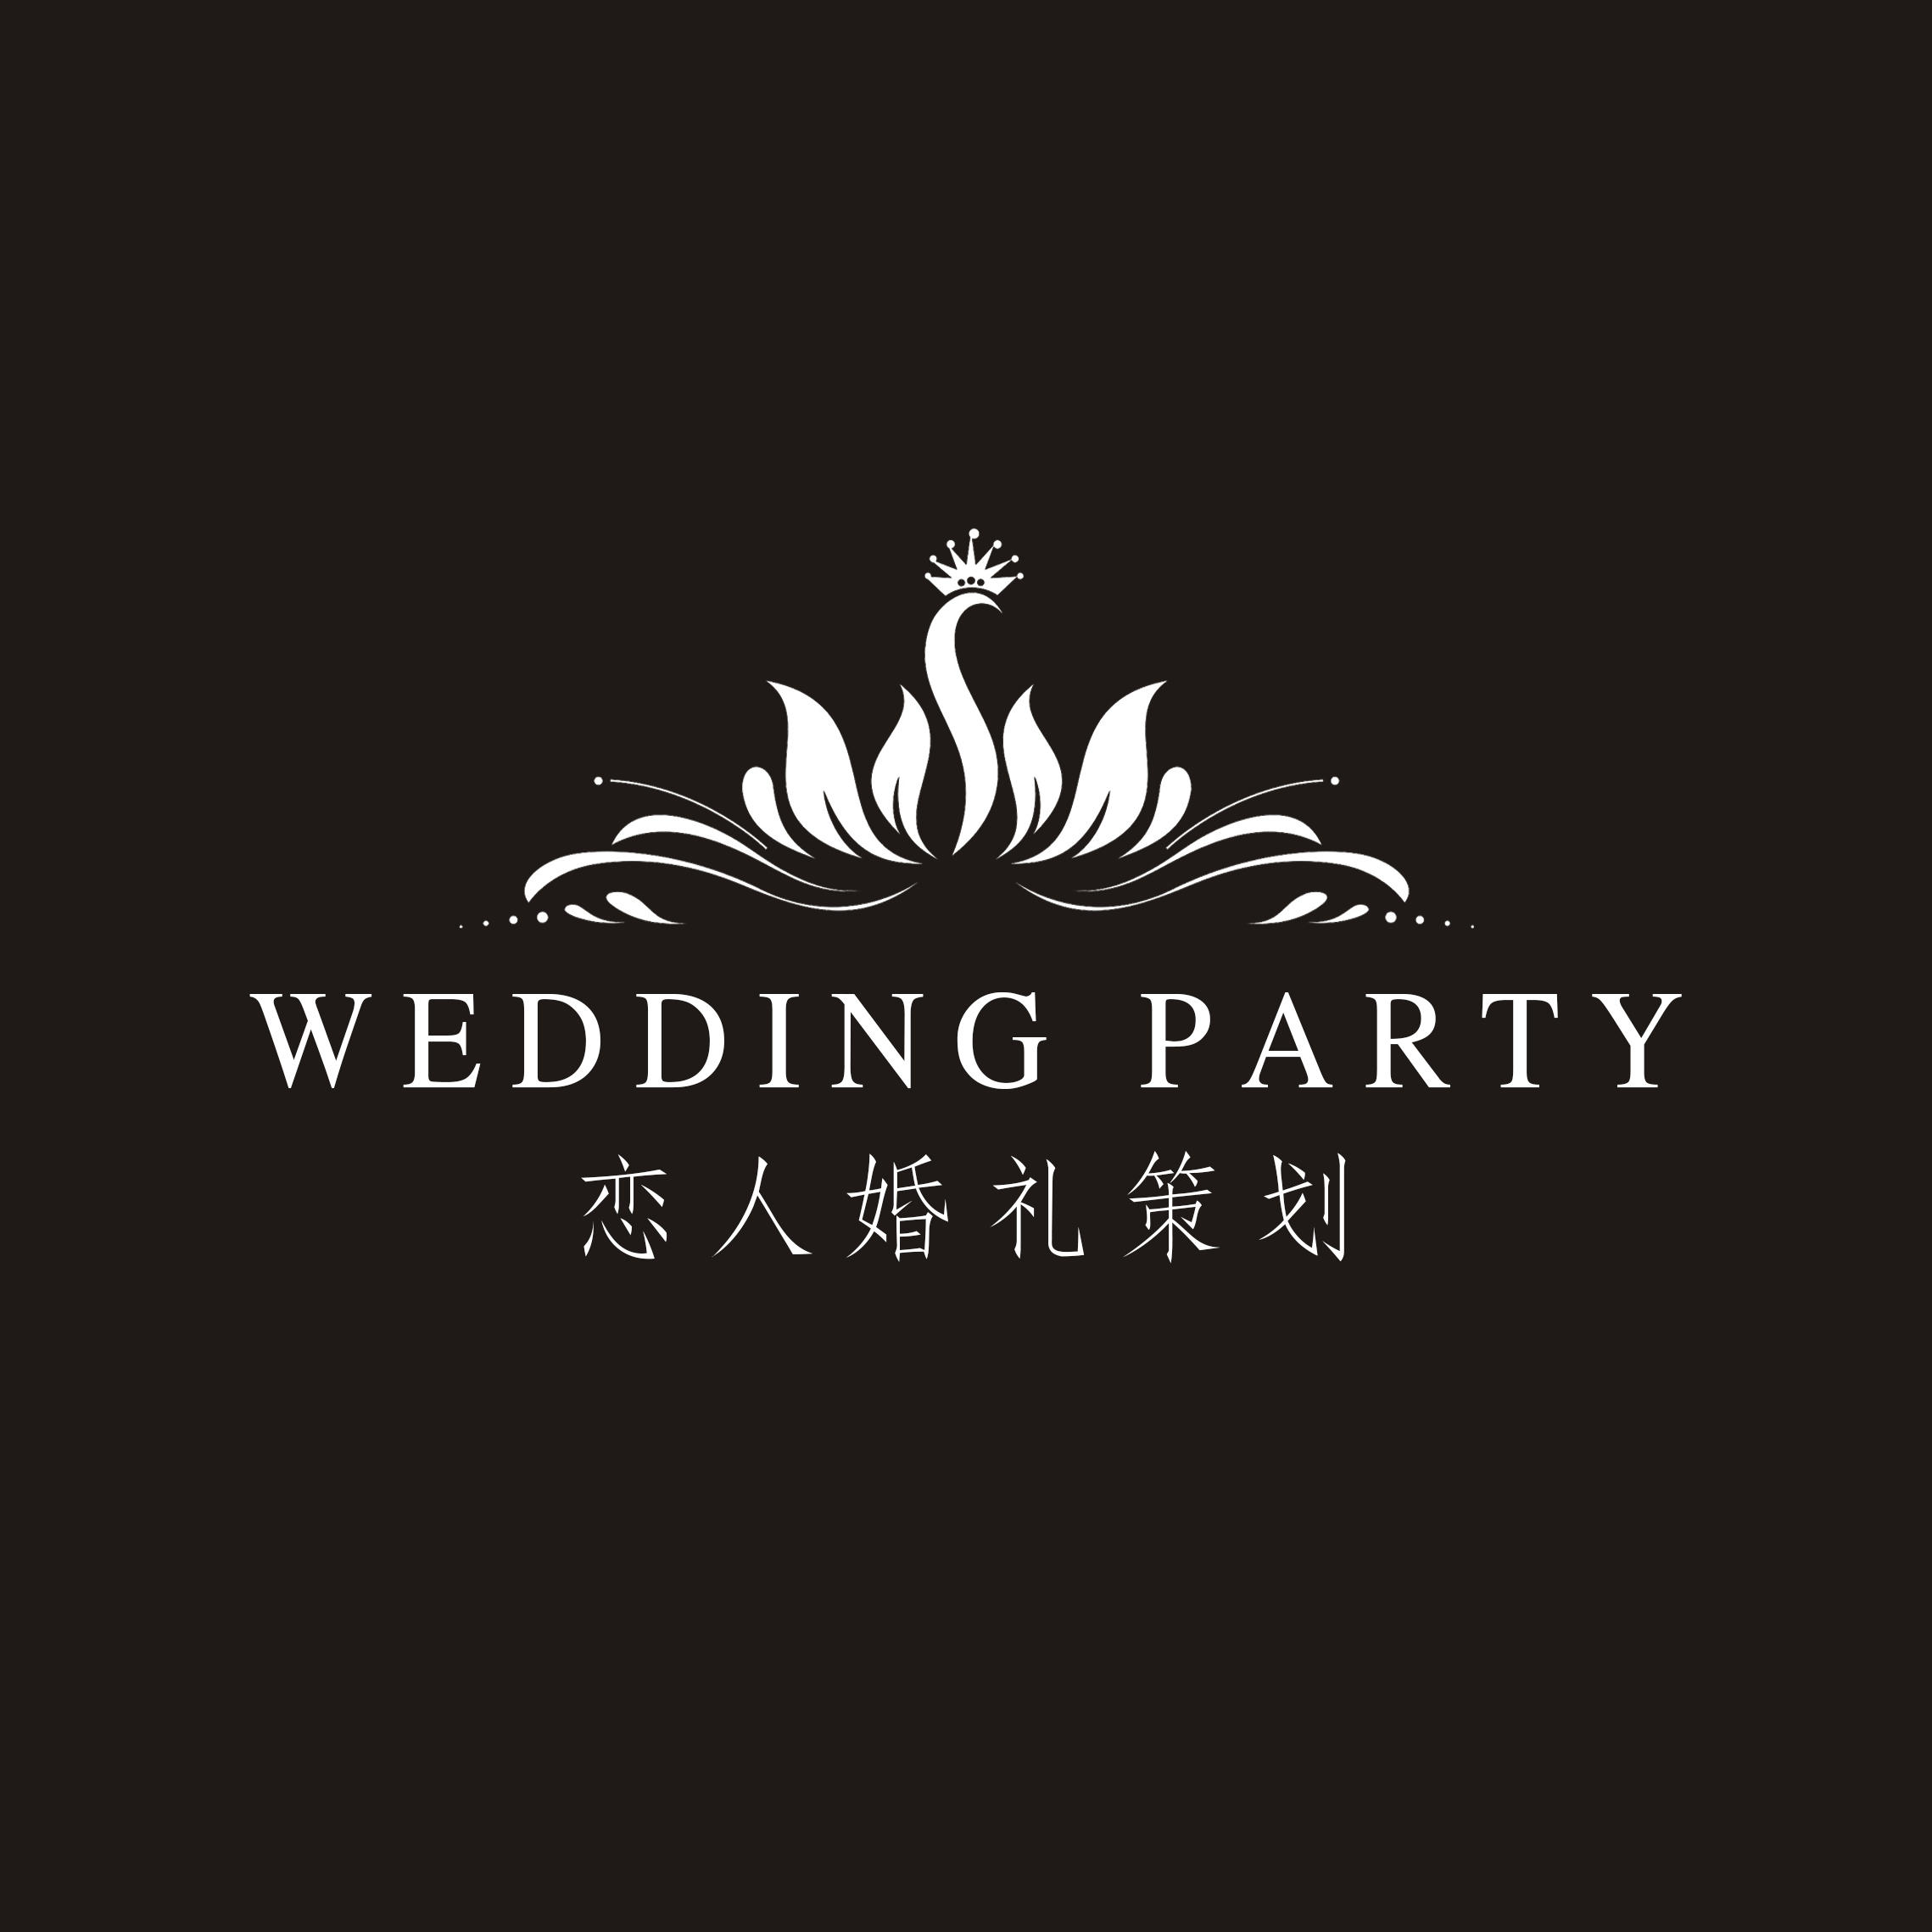 Wedding Party 恋人婚礼策划